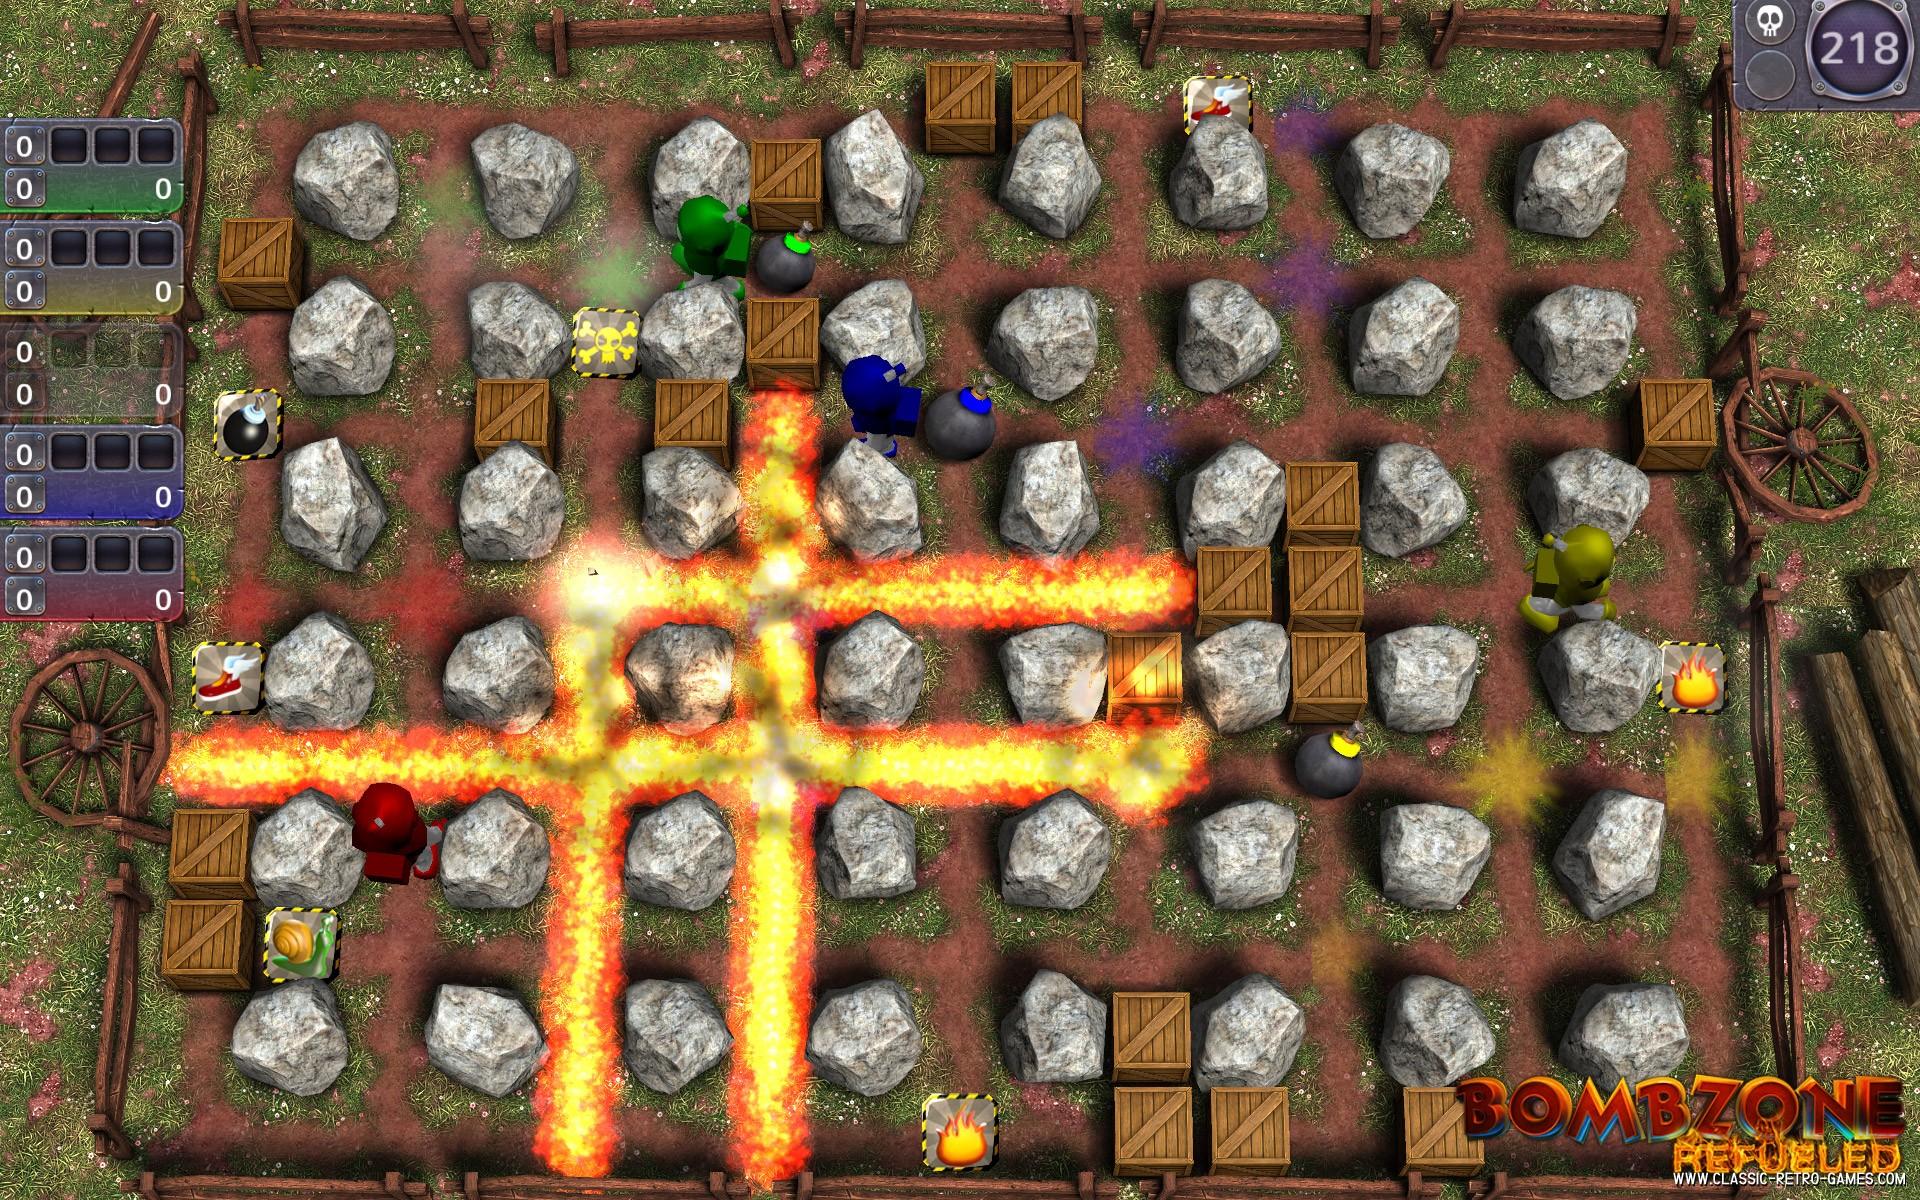 Bomberman remake screenshot